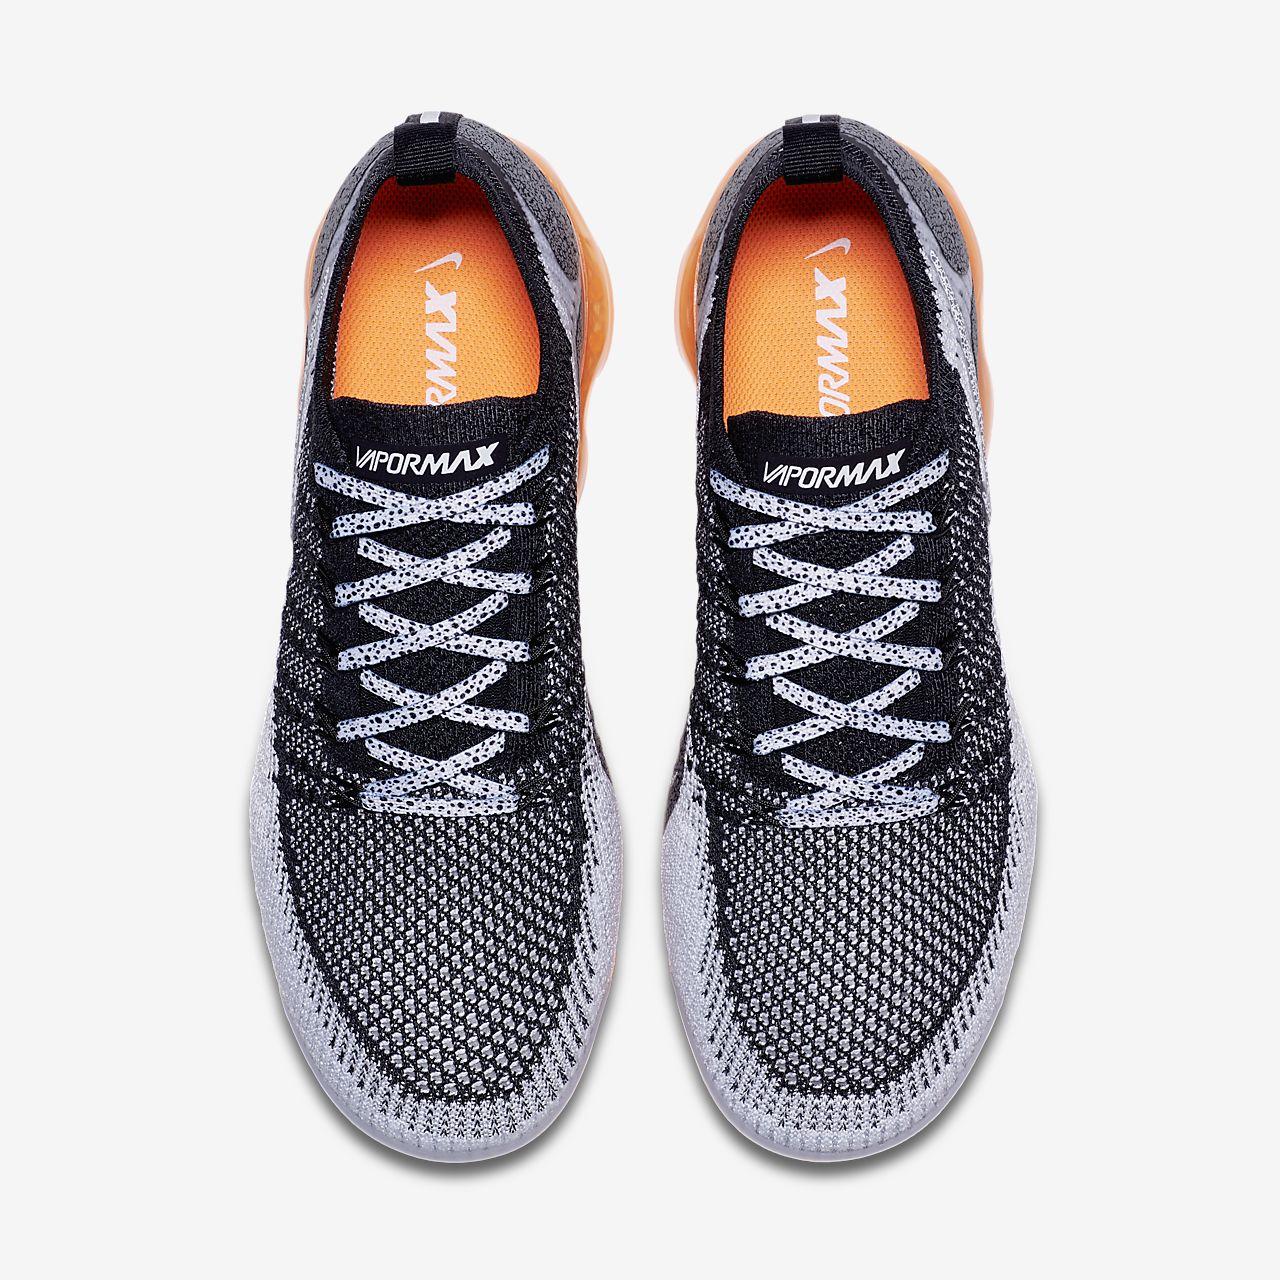 7469a65b9db Chaussure Nike Air VaporMax Flyknit 2 Safari. Nike.com CA